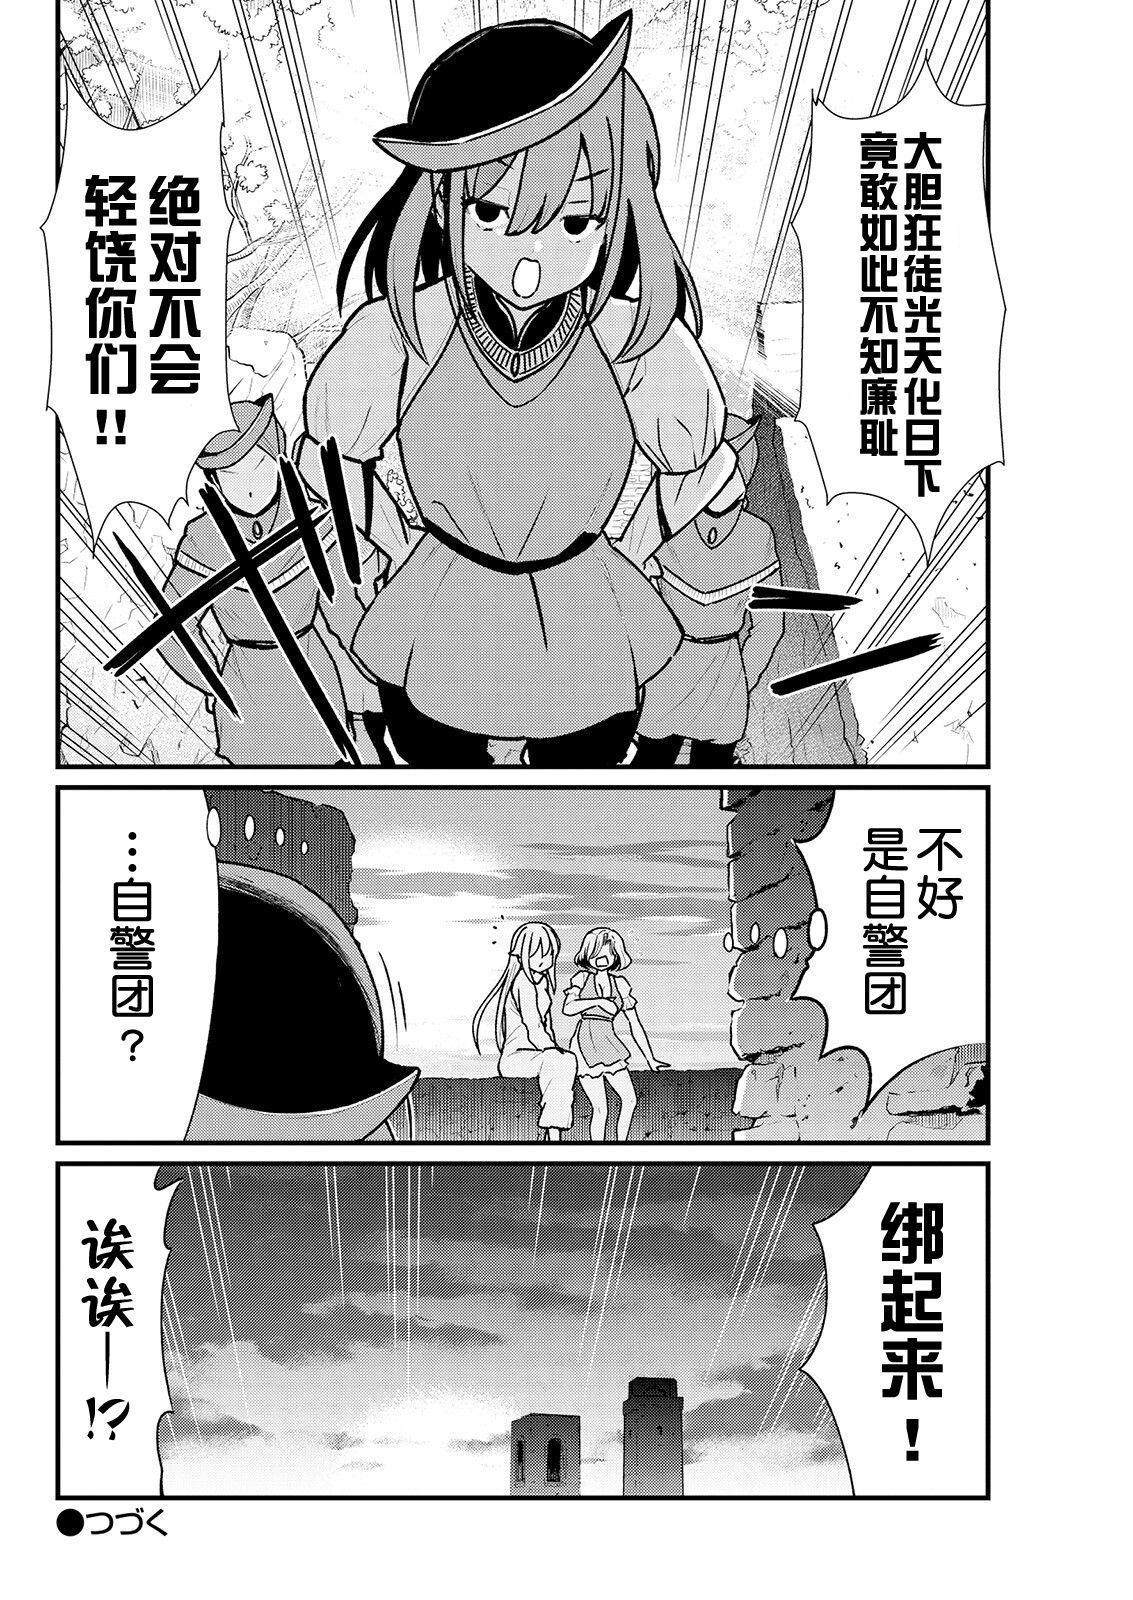 kuxtu koro se no hime kisi to nari, yuri syoukan de hatara ku koto ni nari masi ta. 3 (chinese)(鬼畜王汉化组) 20